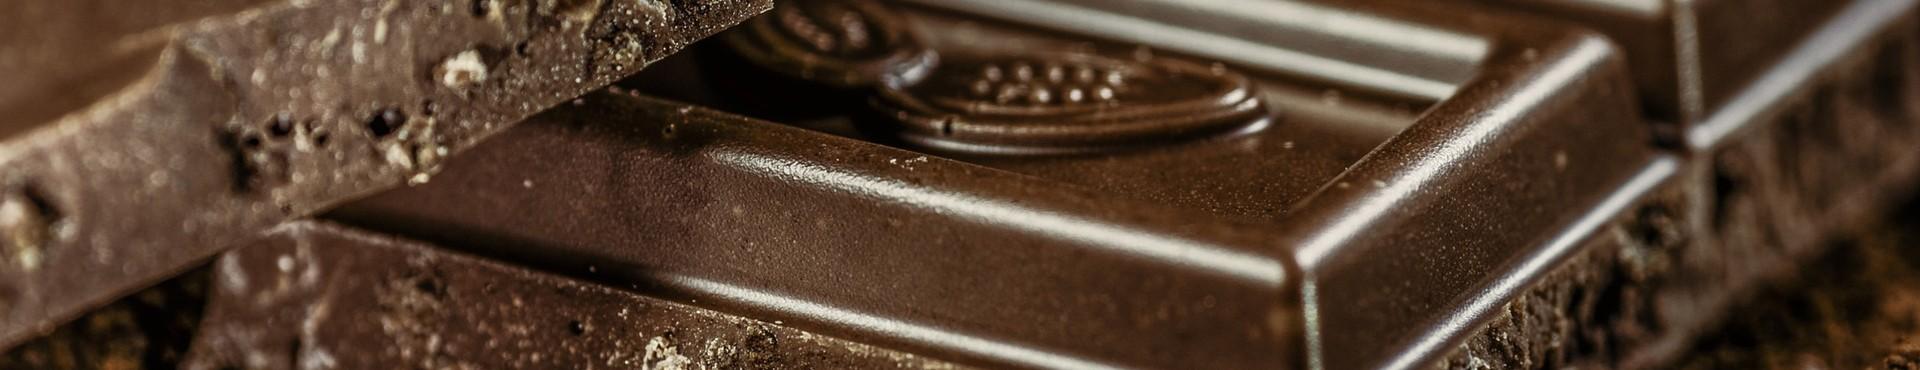 Nos Chocolats - OnWine